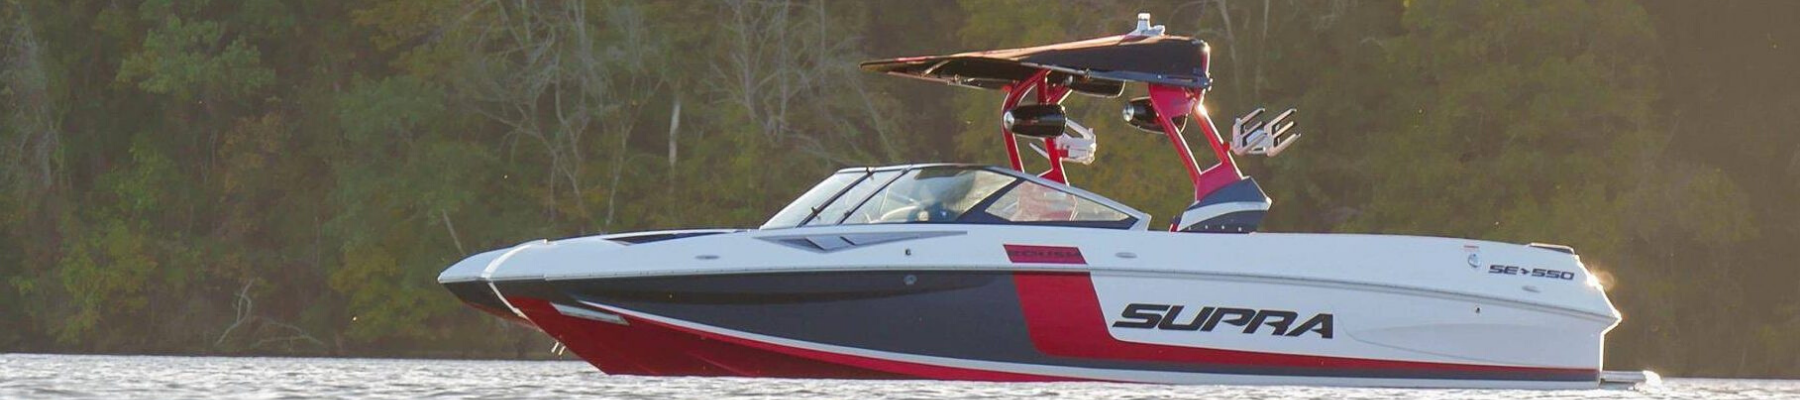 Supra Boat 8